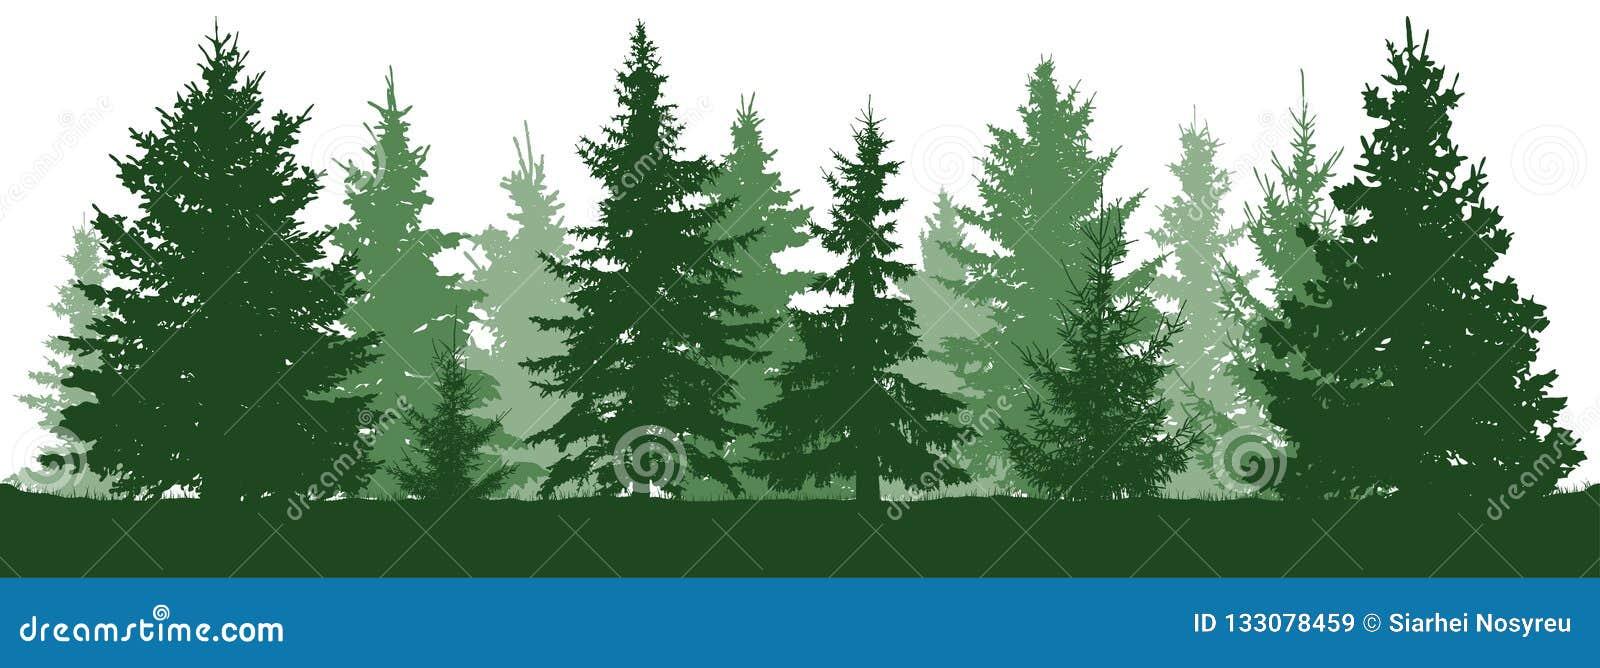 Forest fir trees silhouette. Coniferous green spruce.